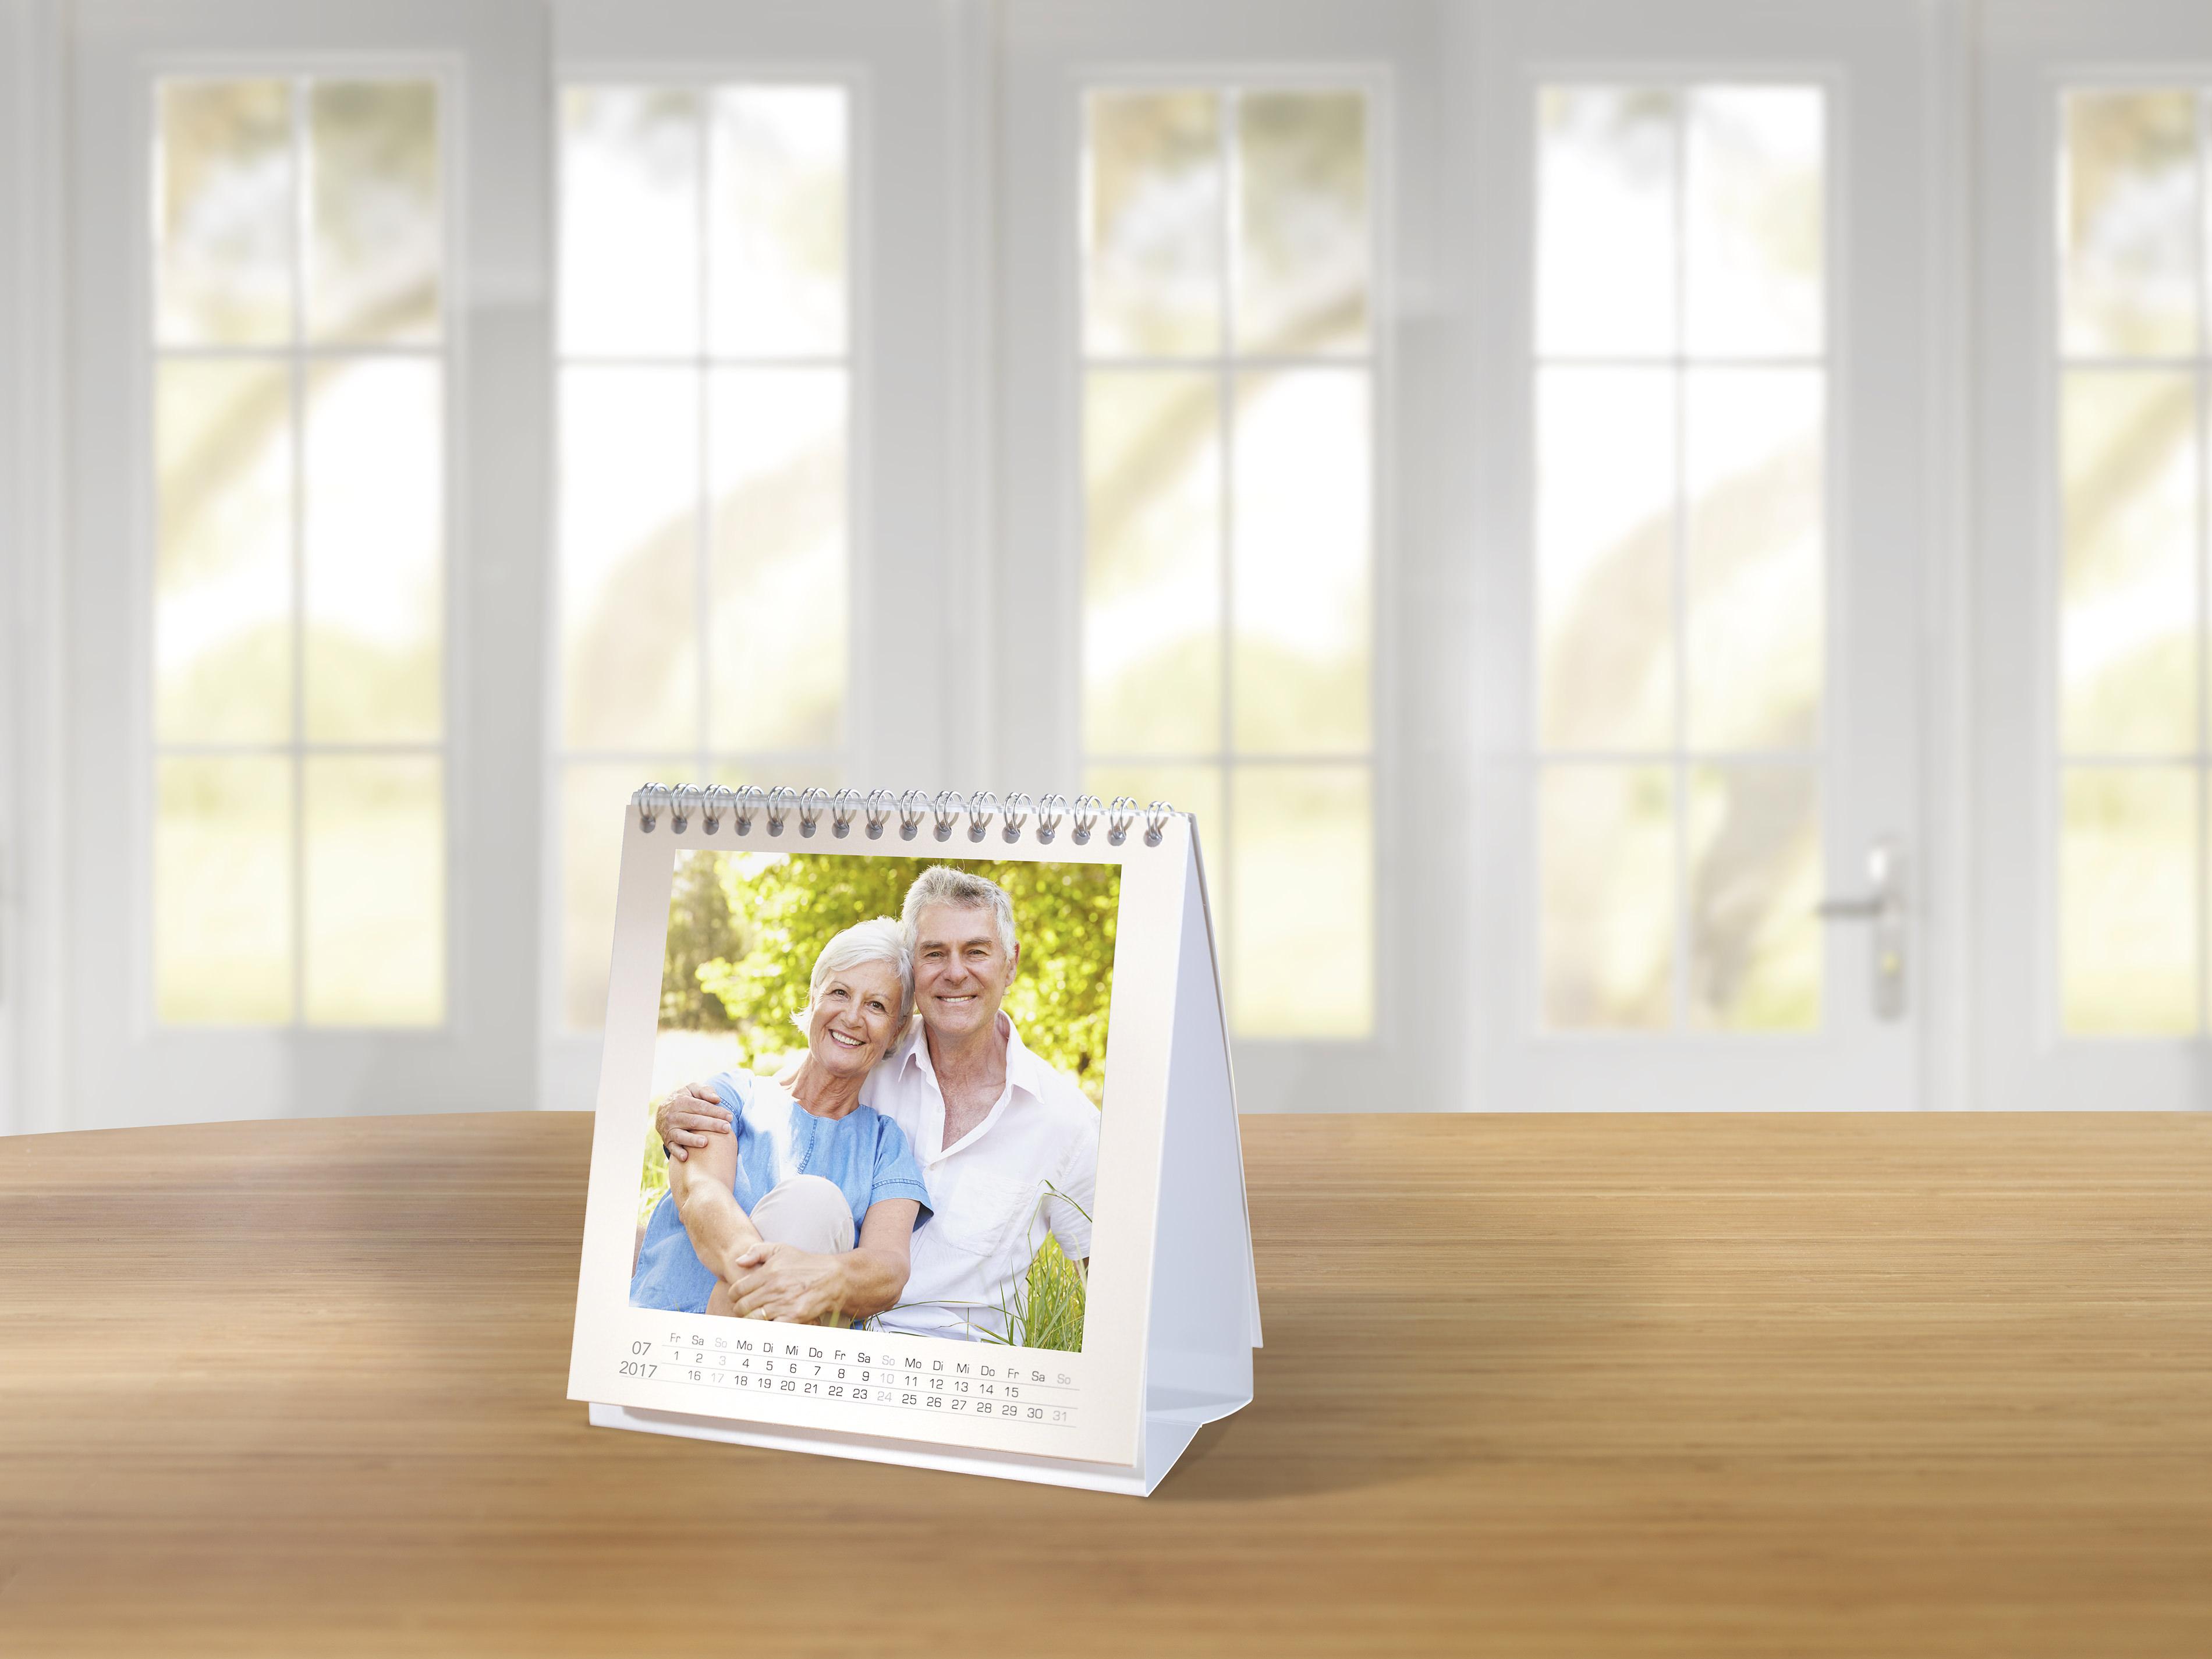 Fototischkalender ohne Kalendarium gestalten   Pixum